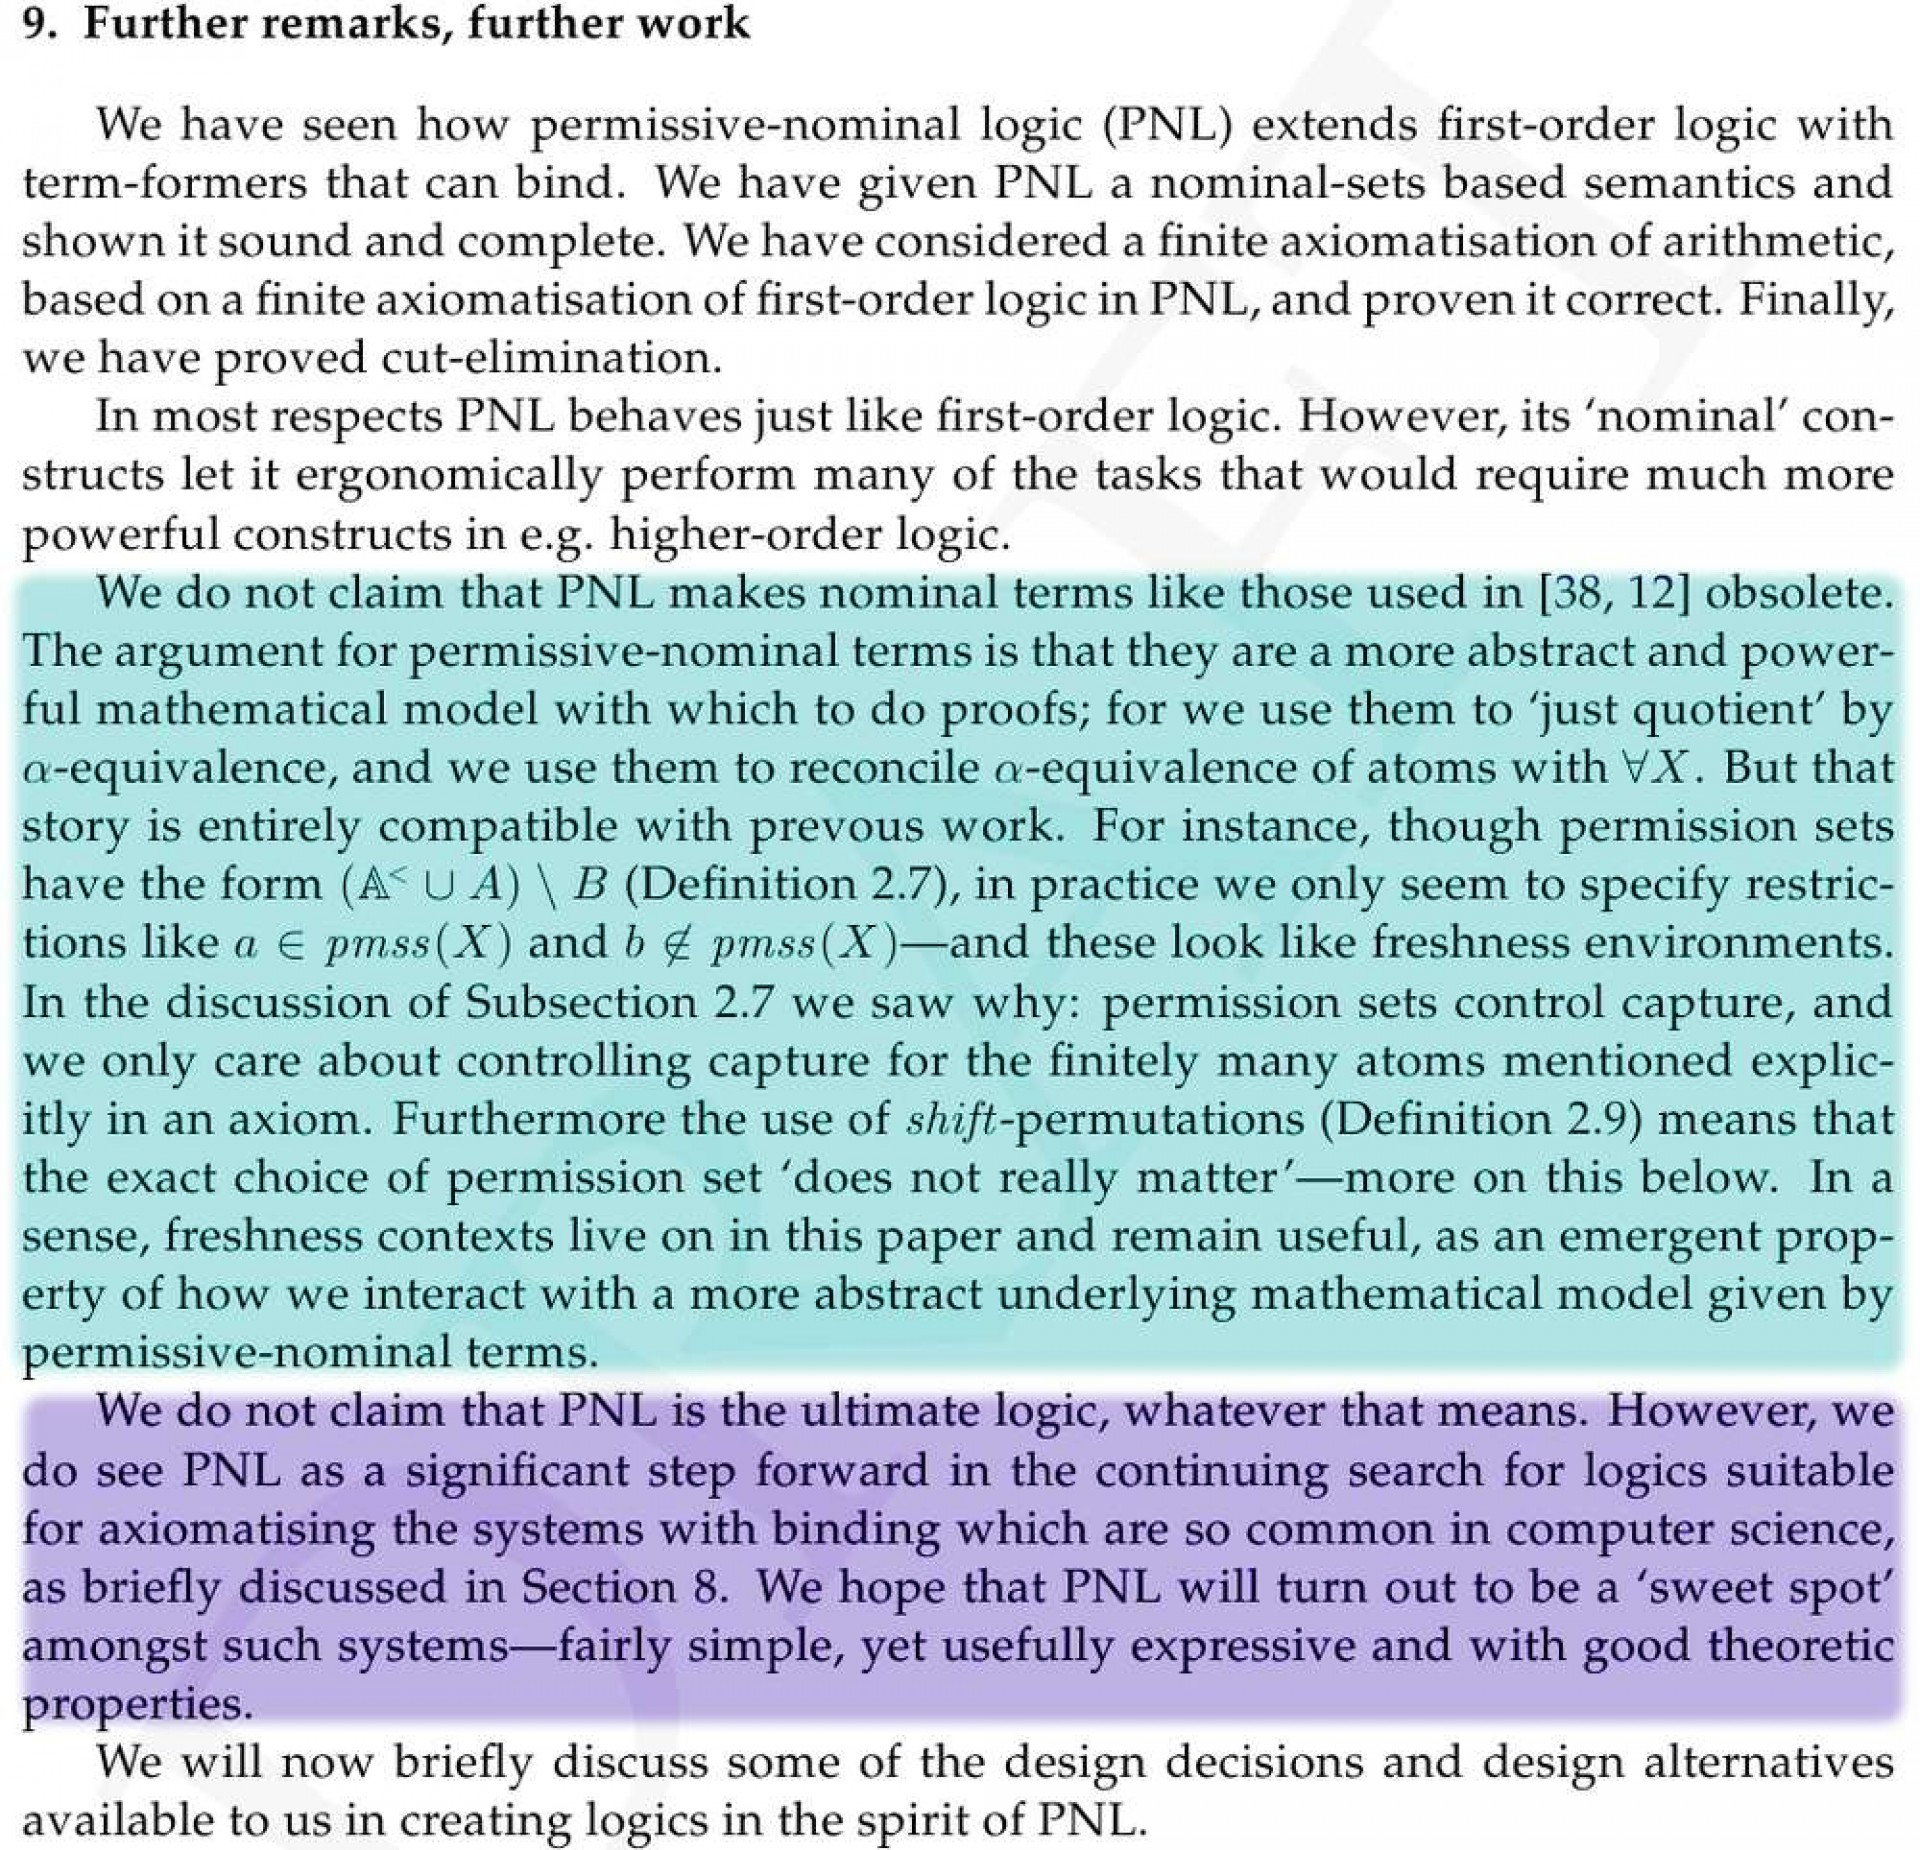 013 Essay Example Persuasive Conclusion Impressive Paragraph Examples Structure 1920